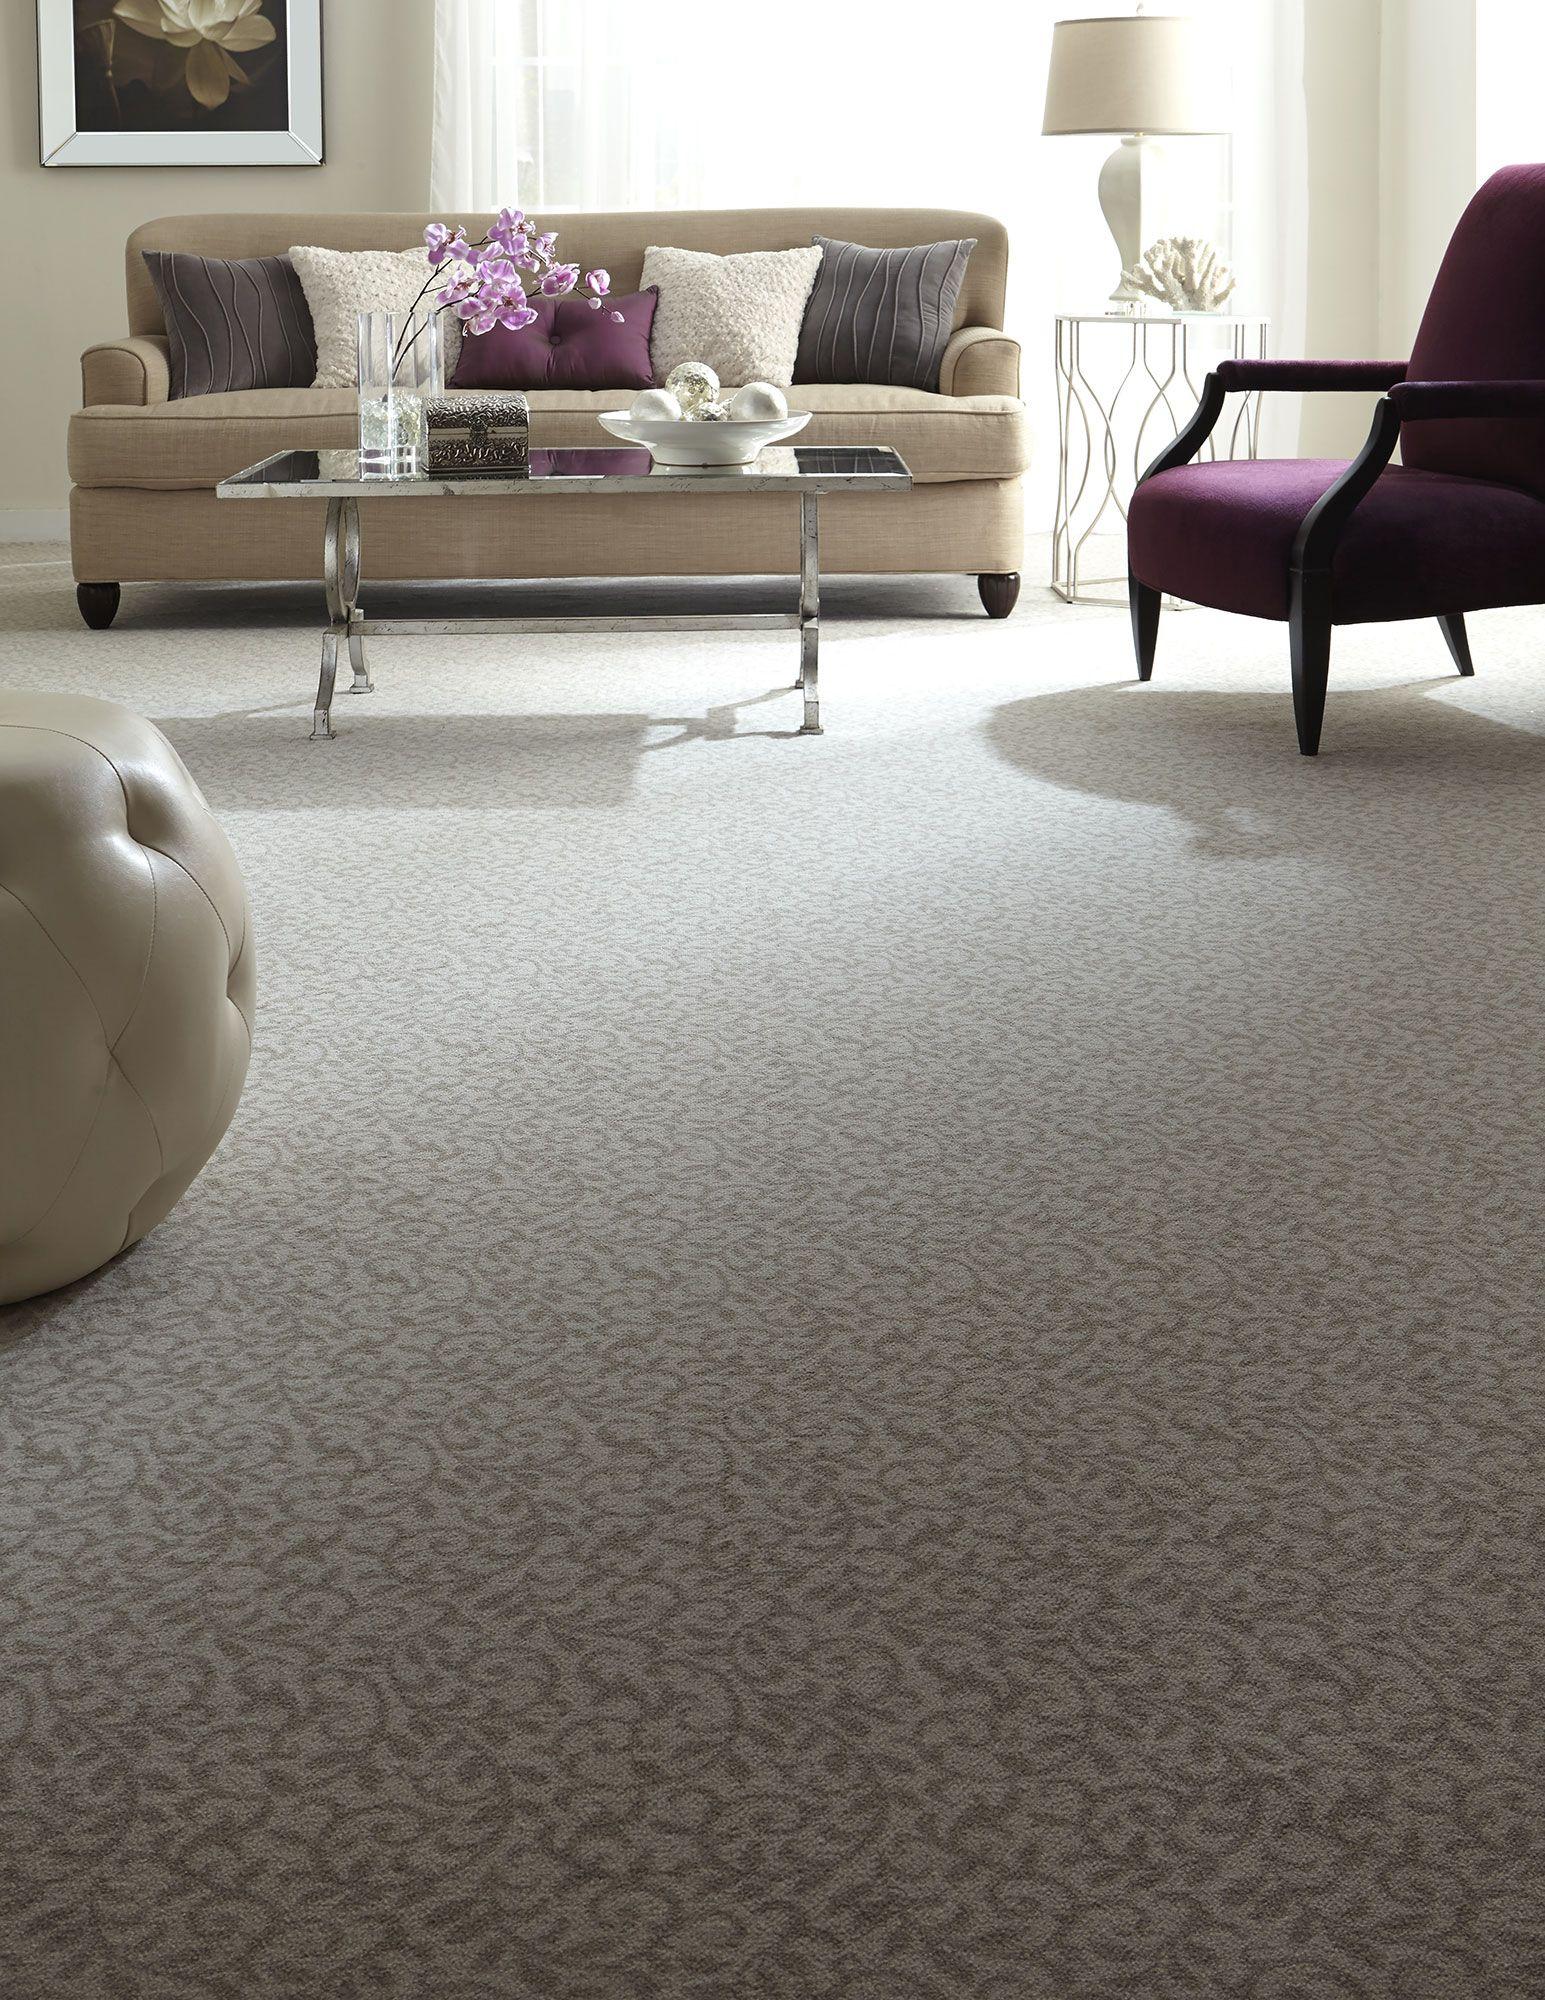 Patterned Carpet Pattern Carpeting Carpet Stores Rite Rug Living Room Carpet Living Room Rug Size Modern Rugs Living Room